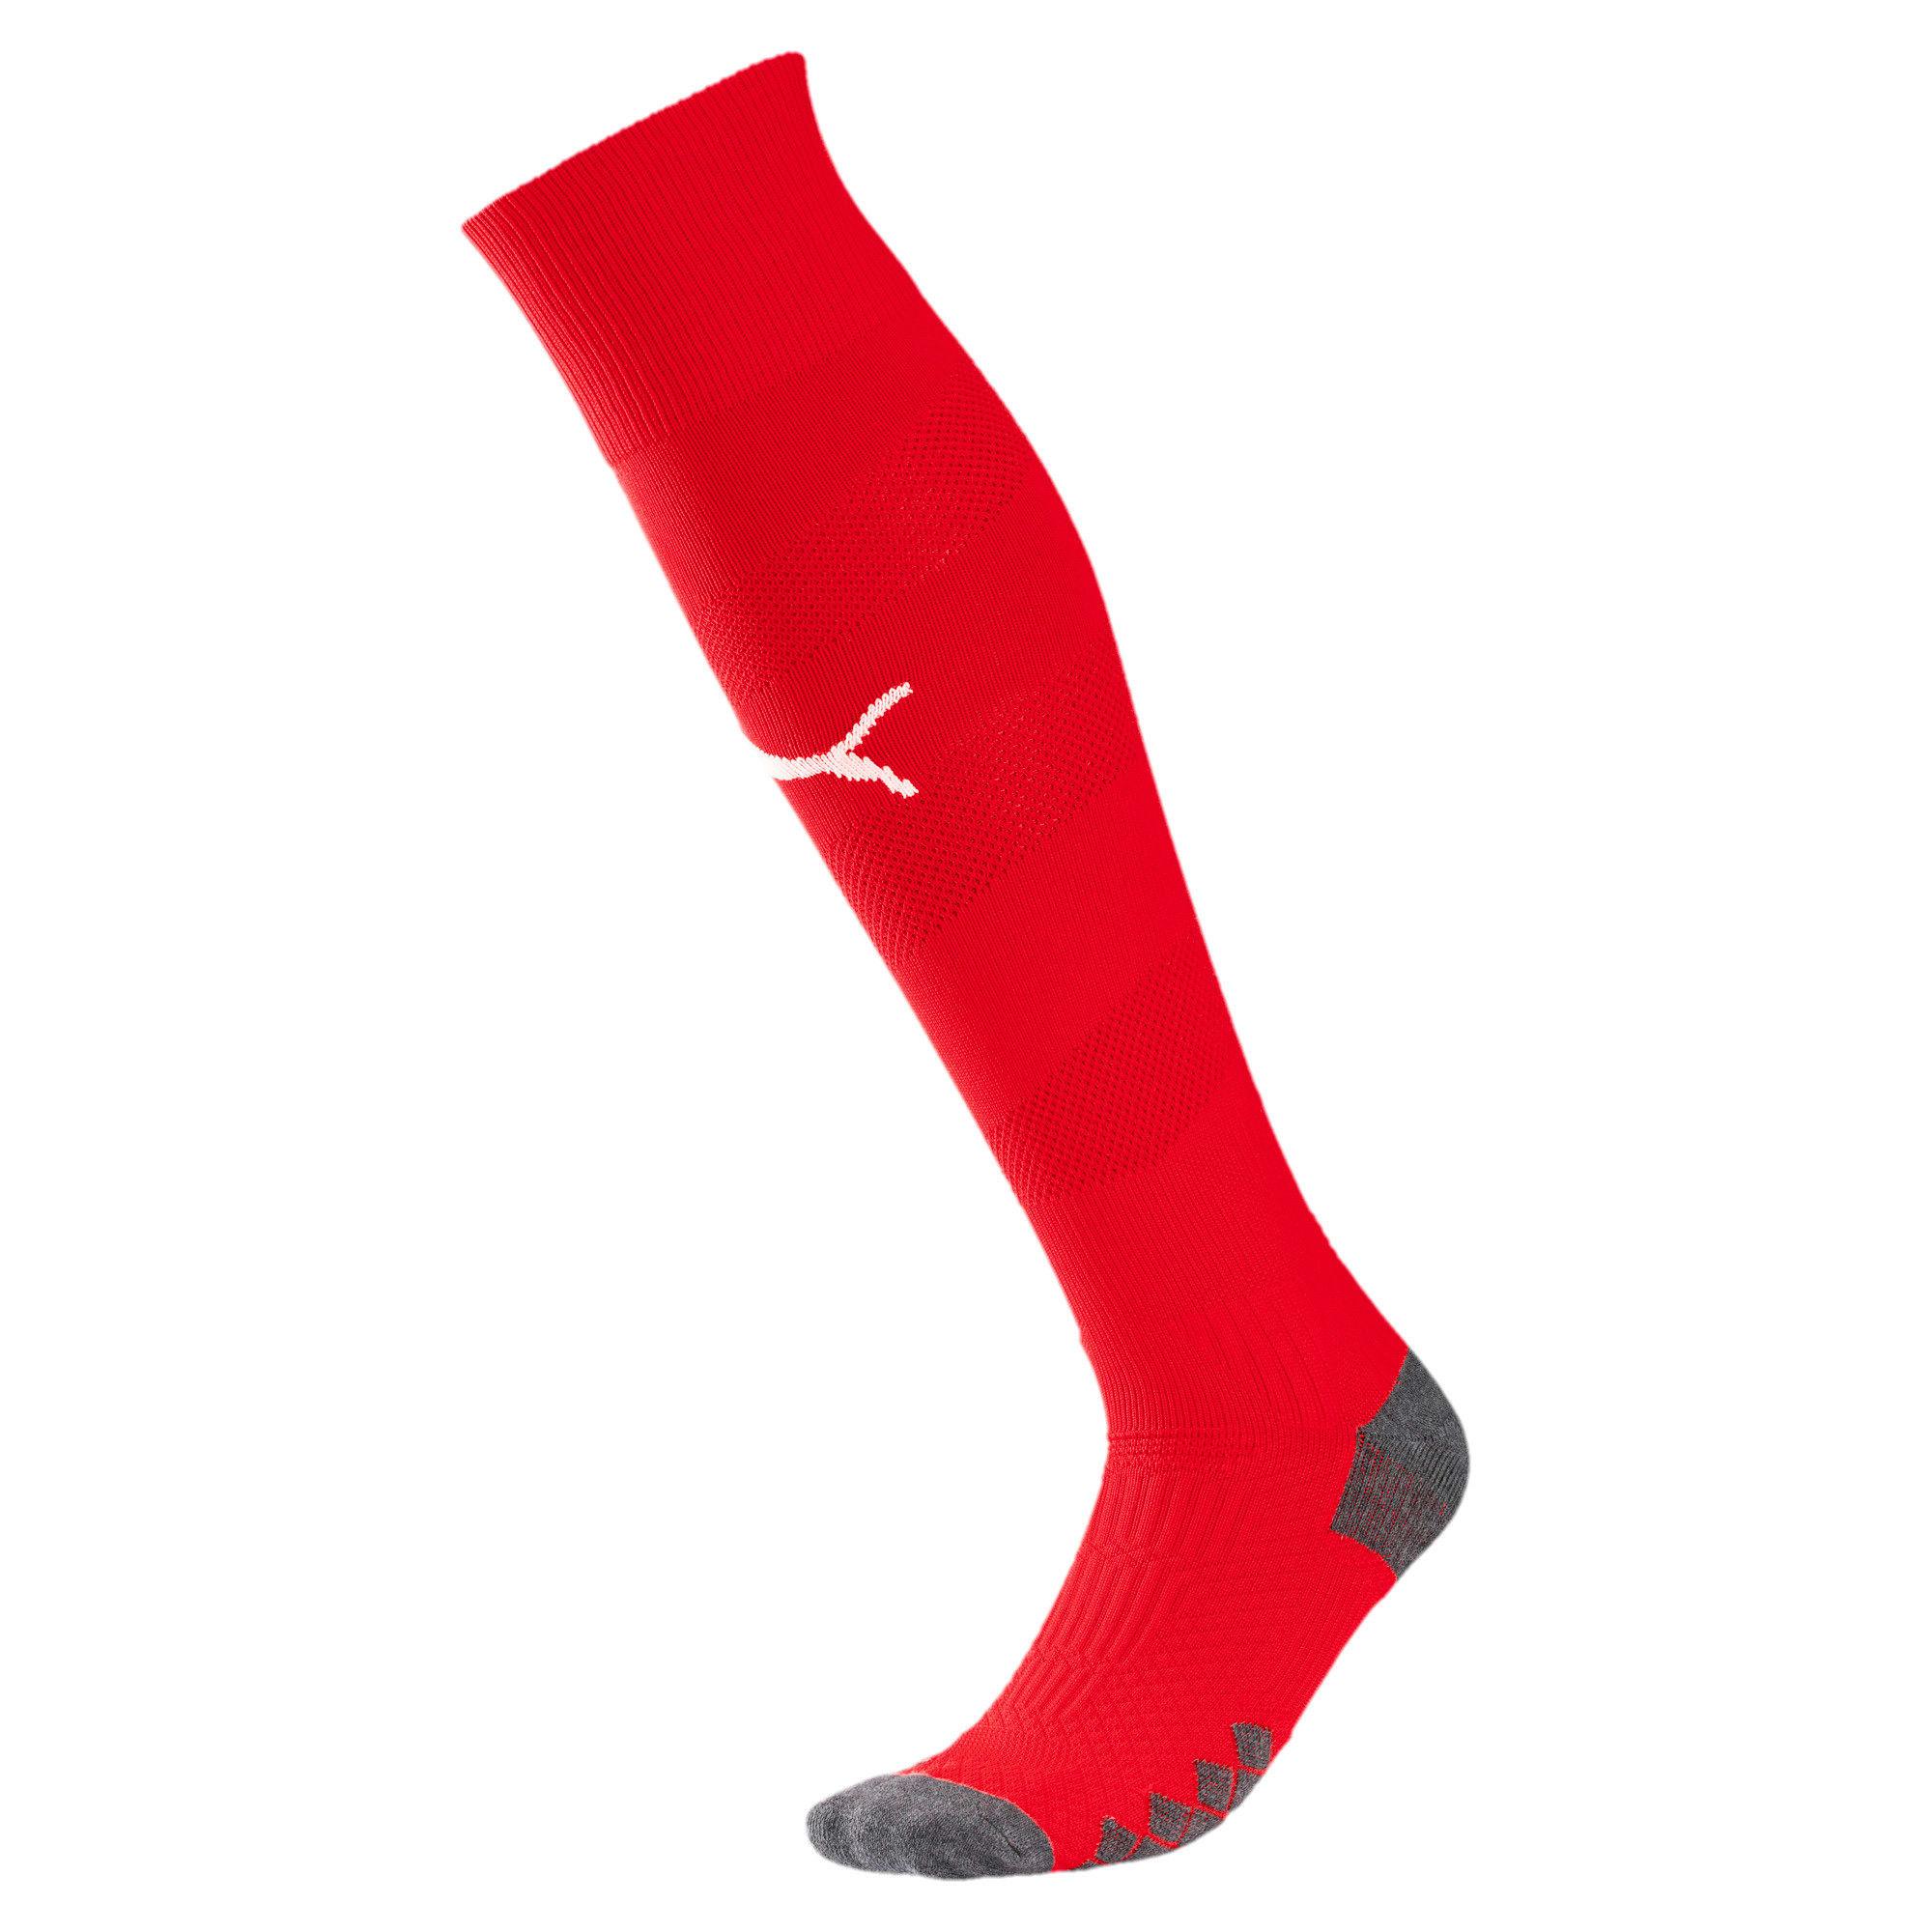 Thumbnail 1 of Olympique de Marseille Spiral Socks, Puma Red-Puma White, medium